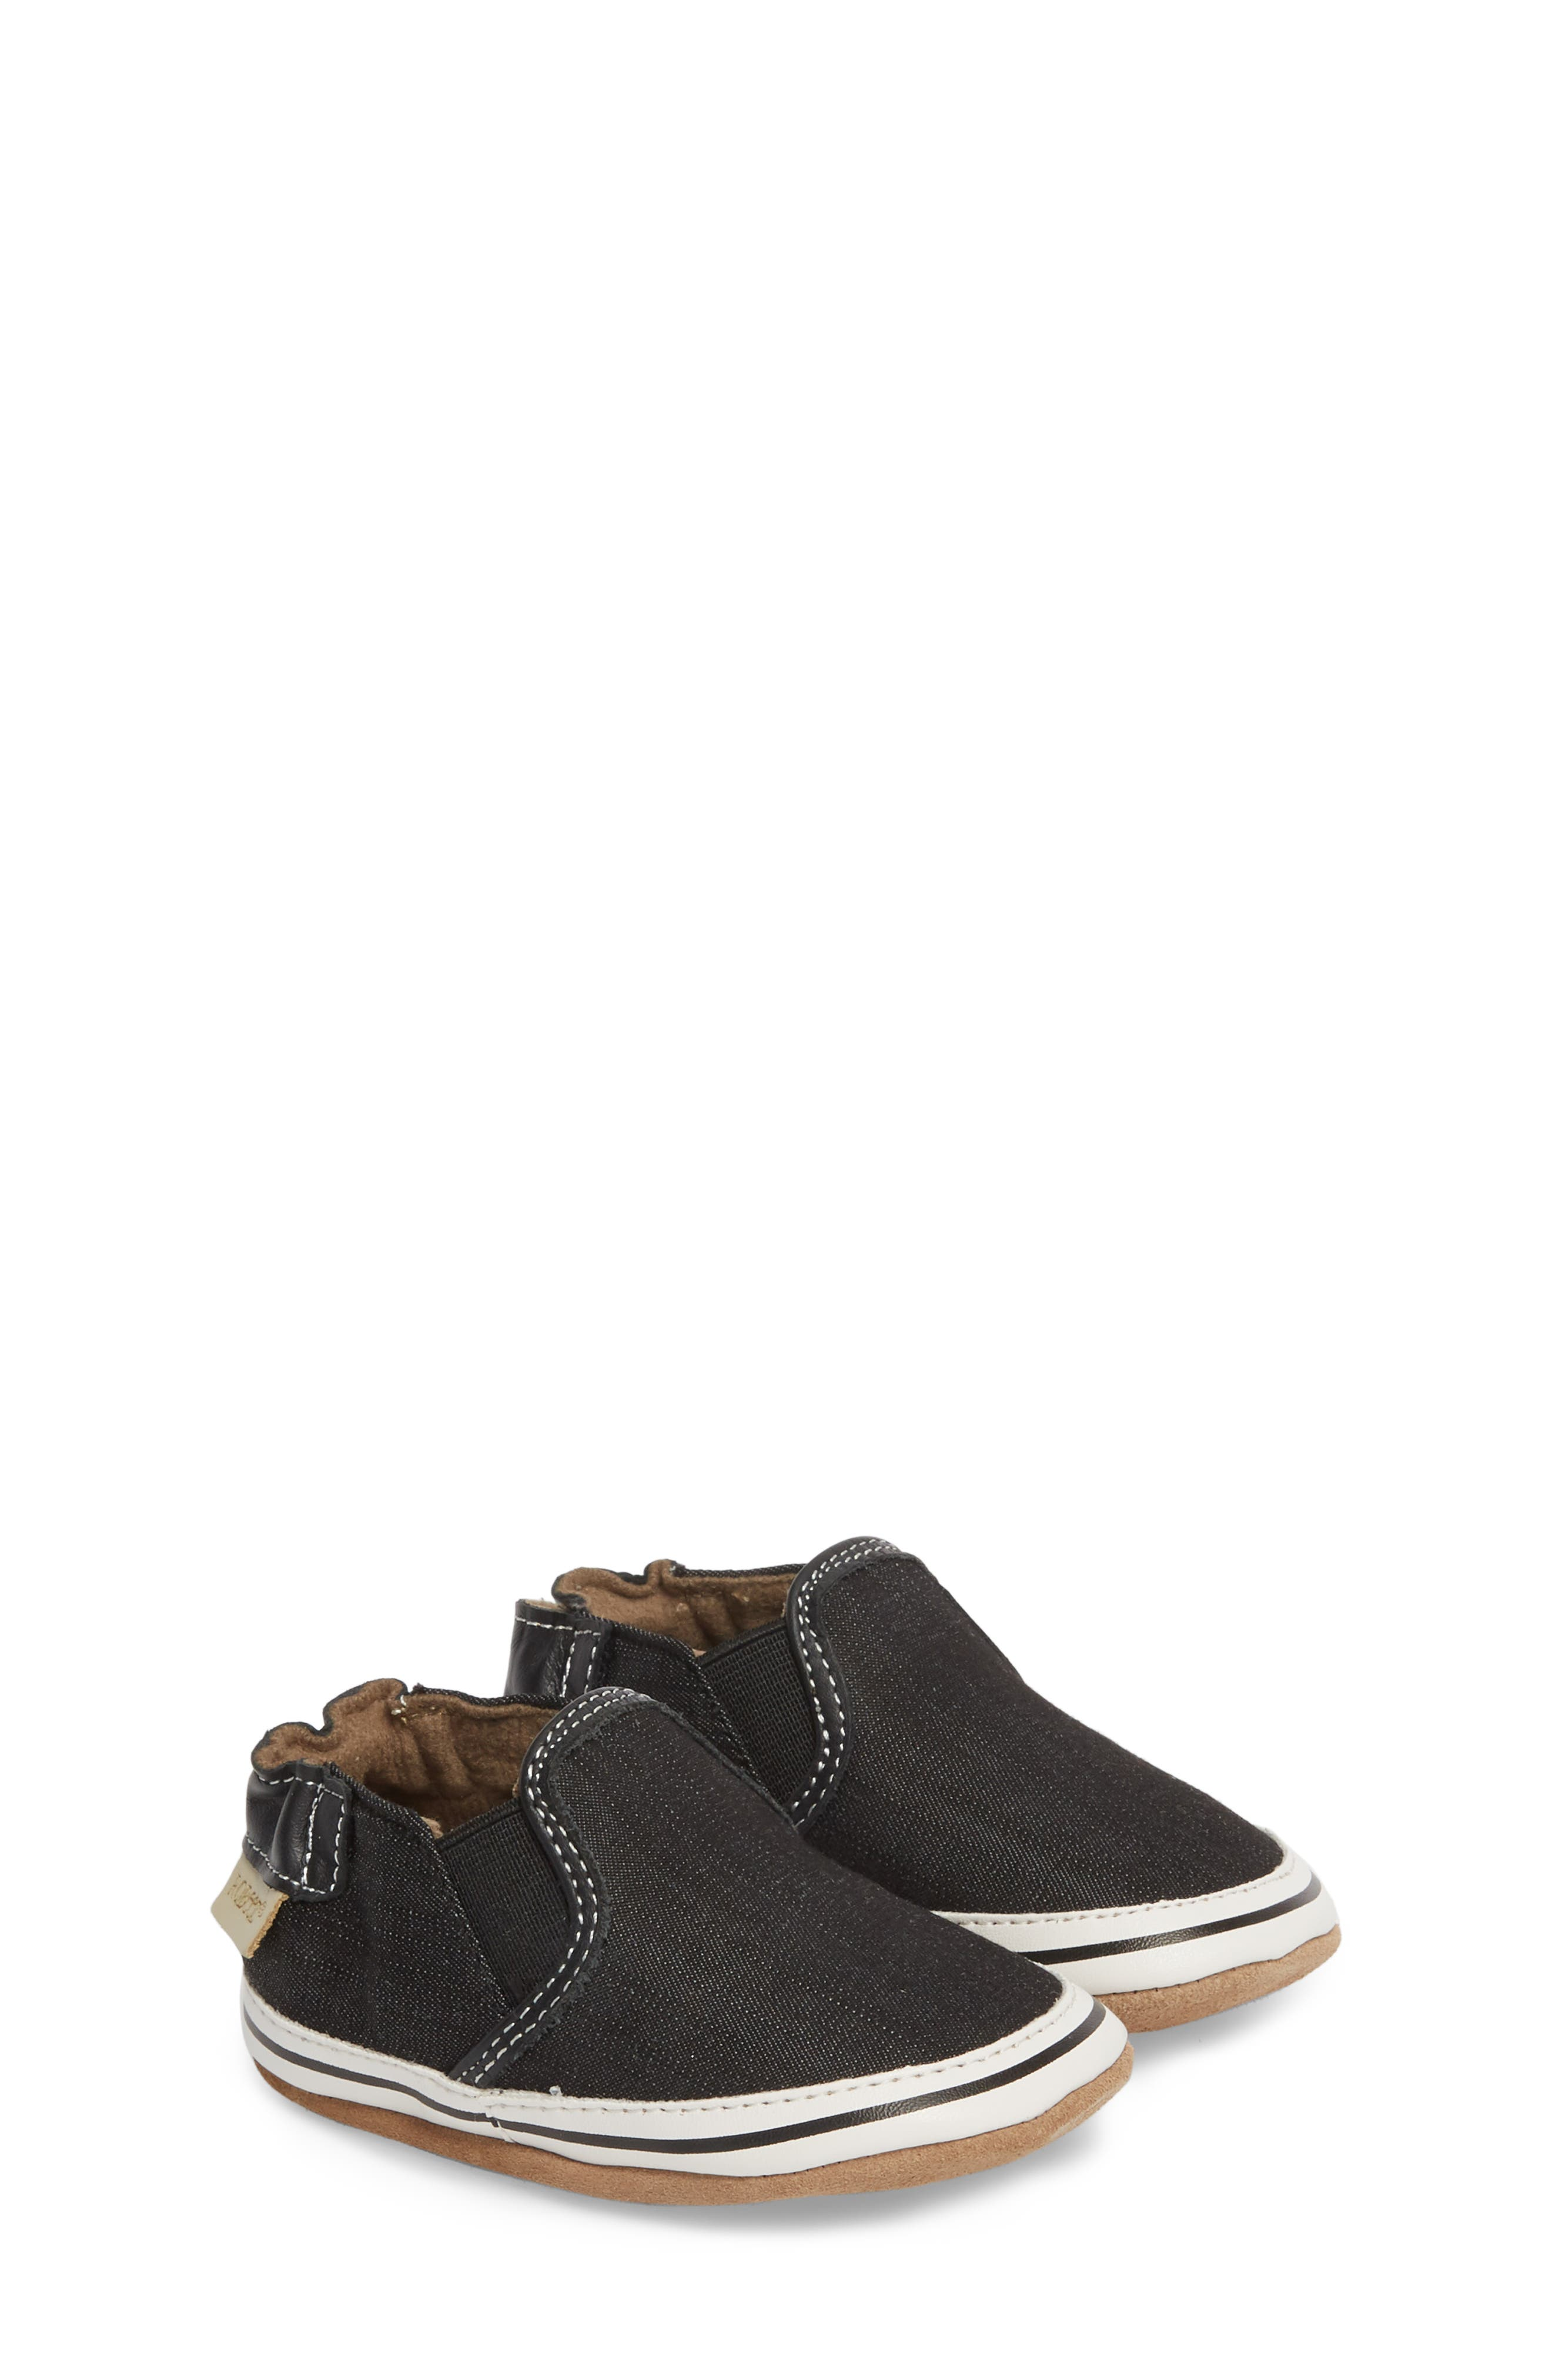 Liam Slip-On Crib Sneaker,                             Main thumbnail 1, color,                             BLACK